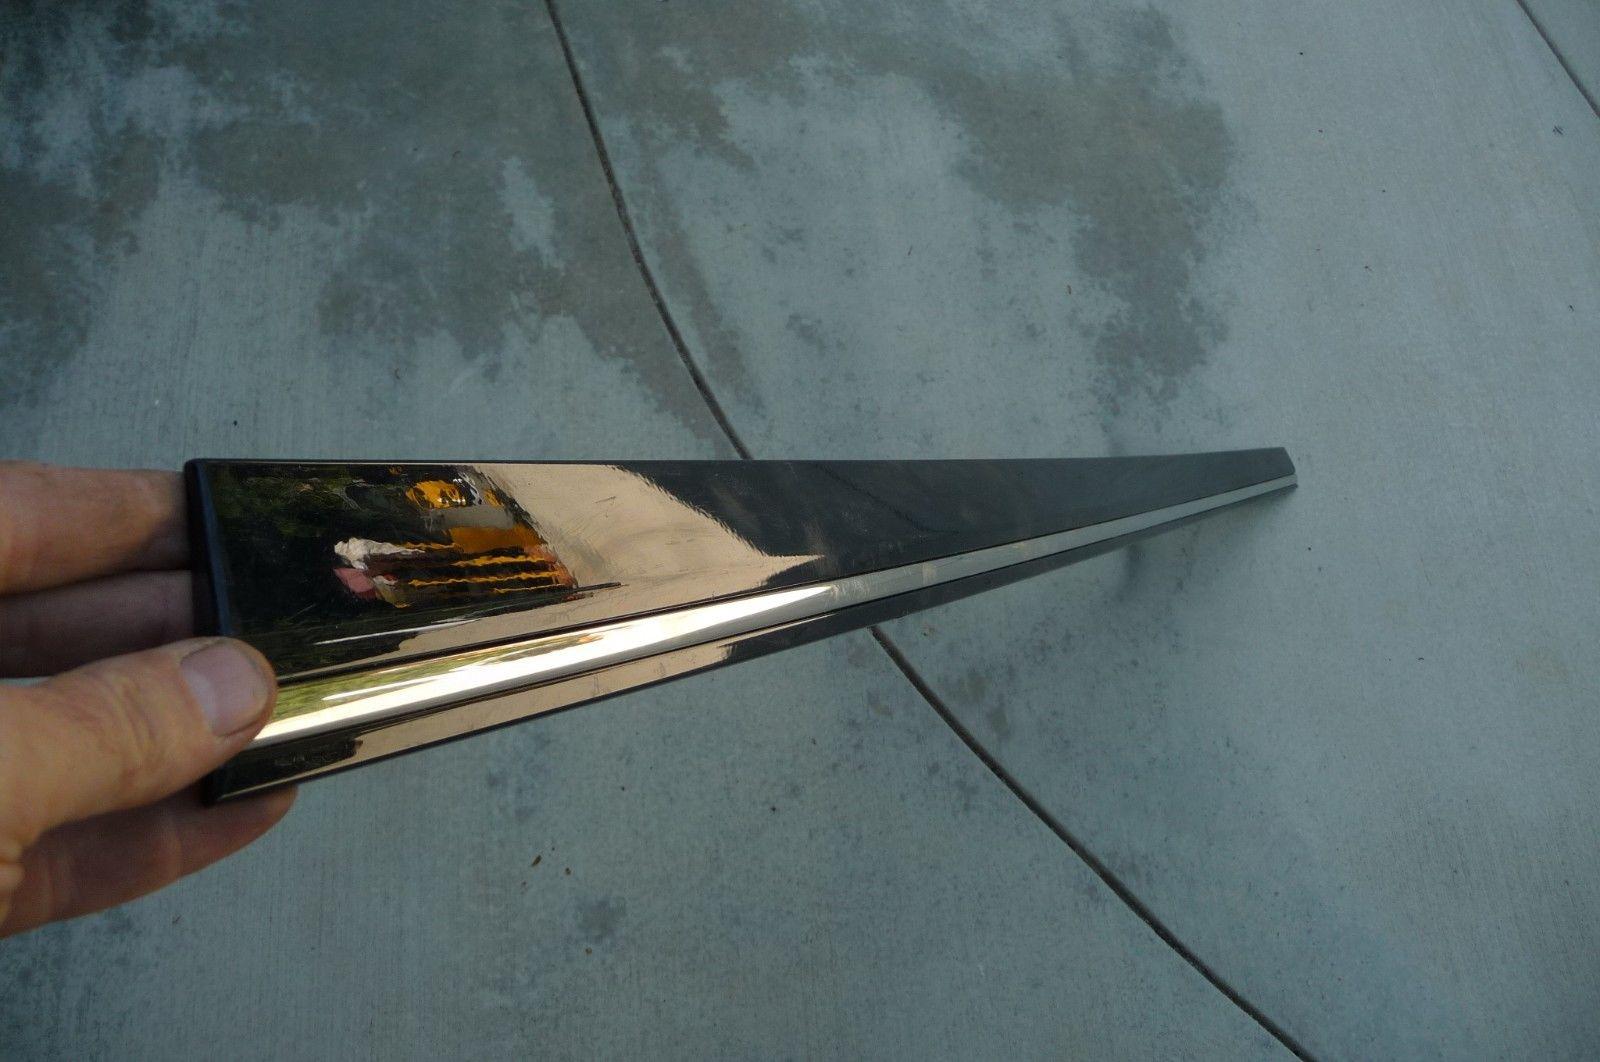 Mercedes Benz CLK Front Left Door Cover Strip Moulding Molding NEW A 2096901182